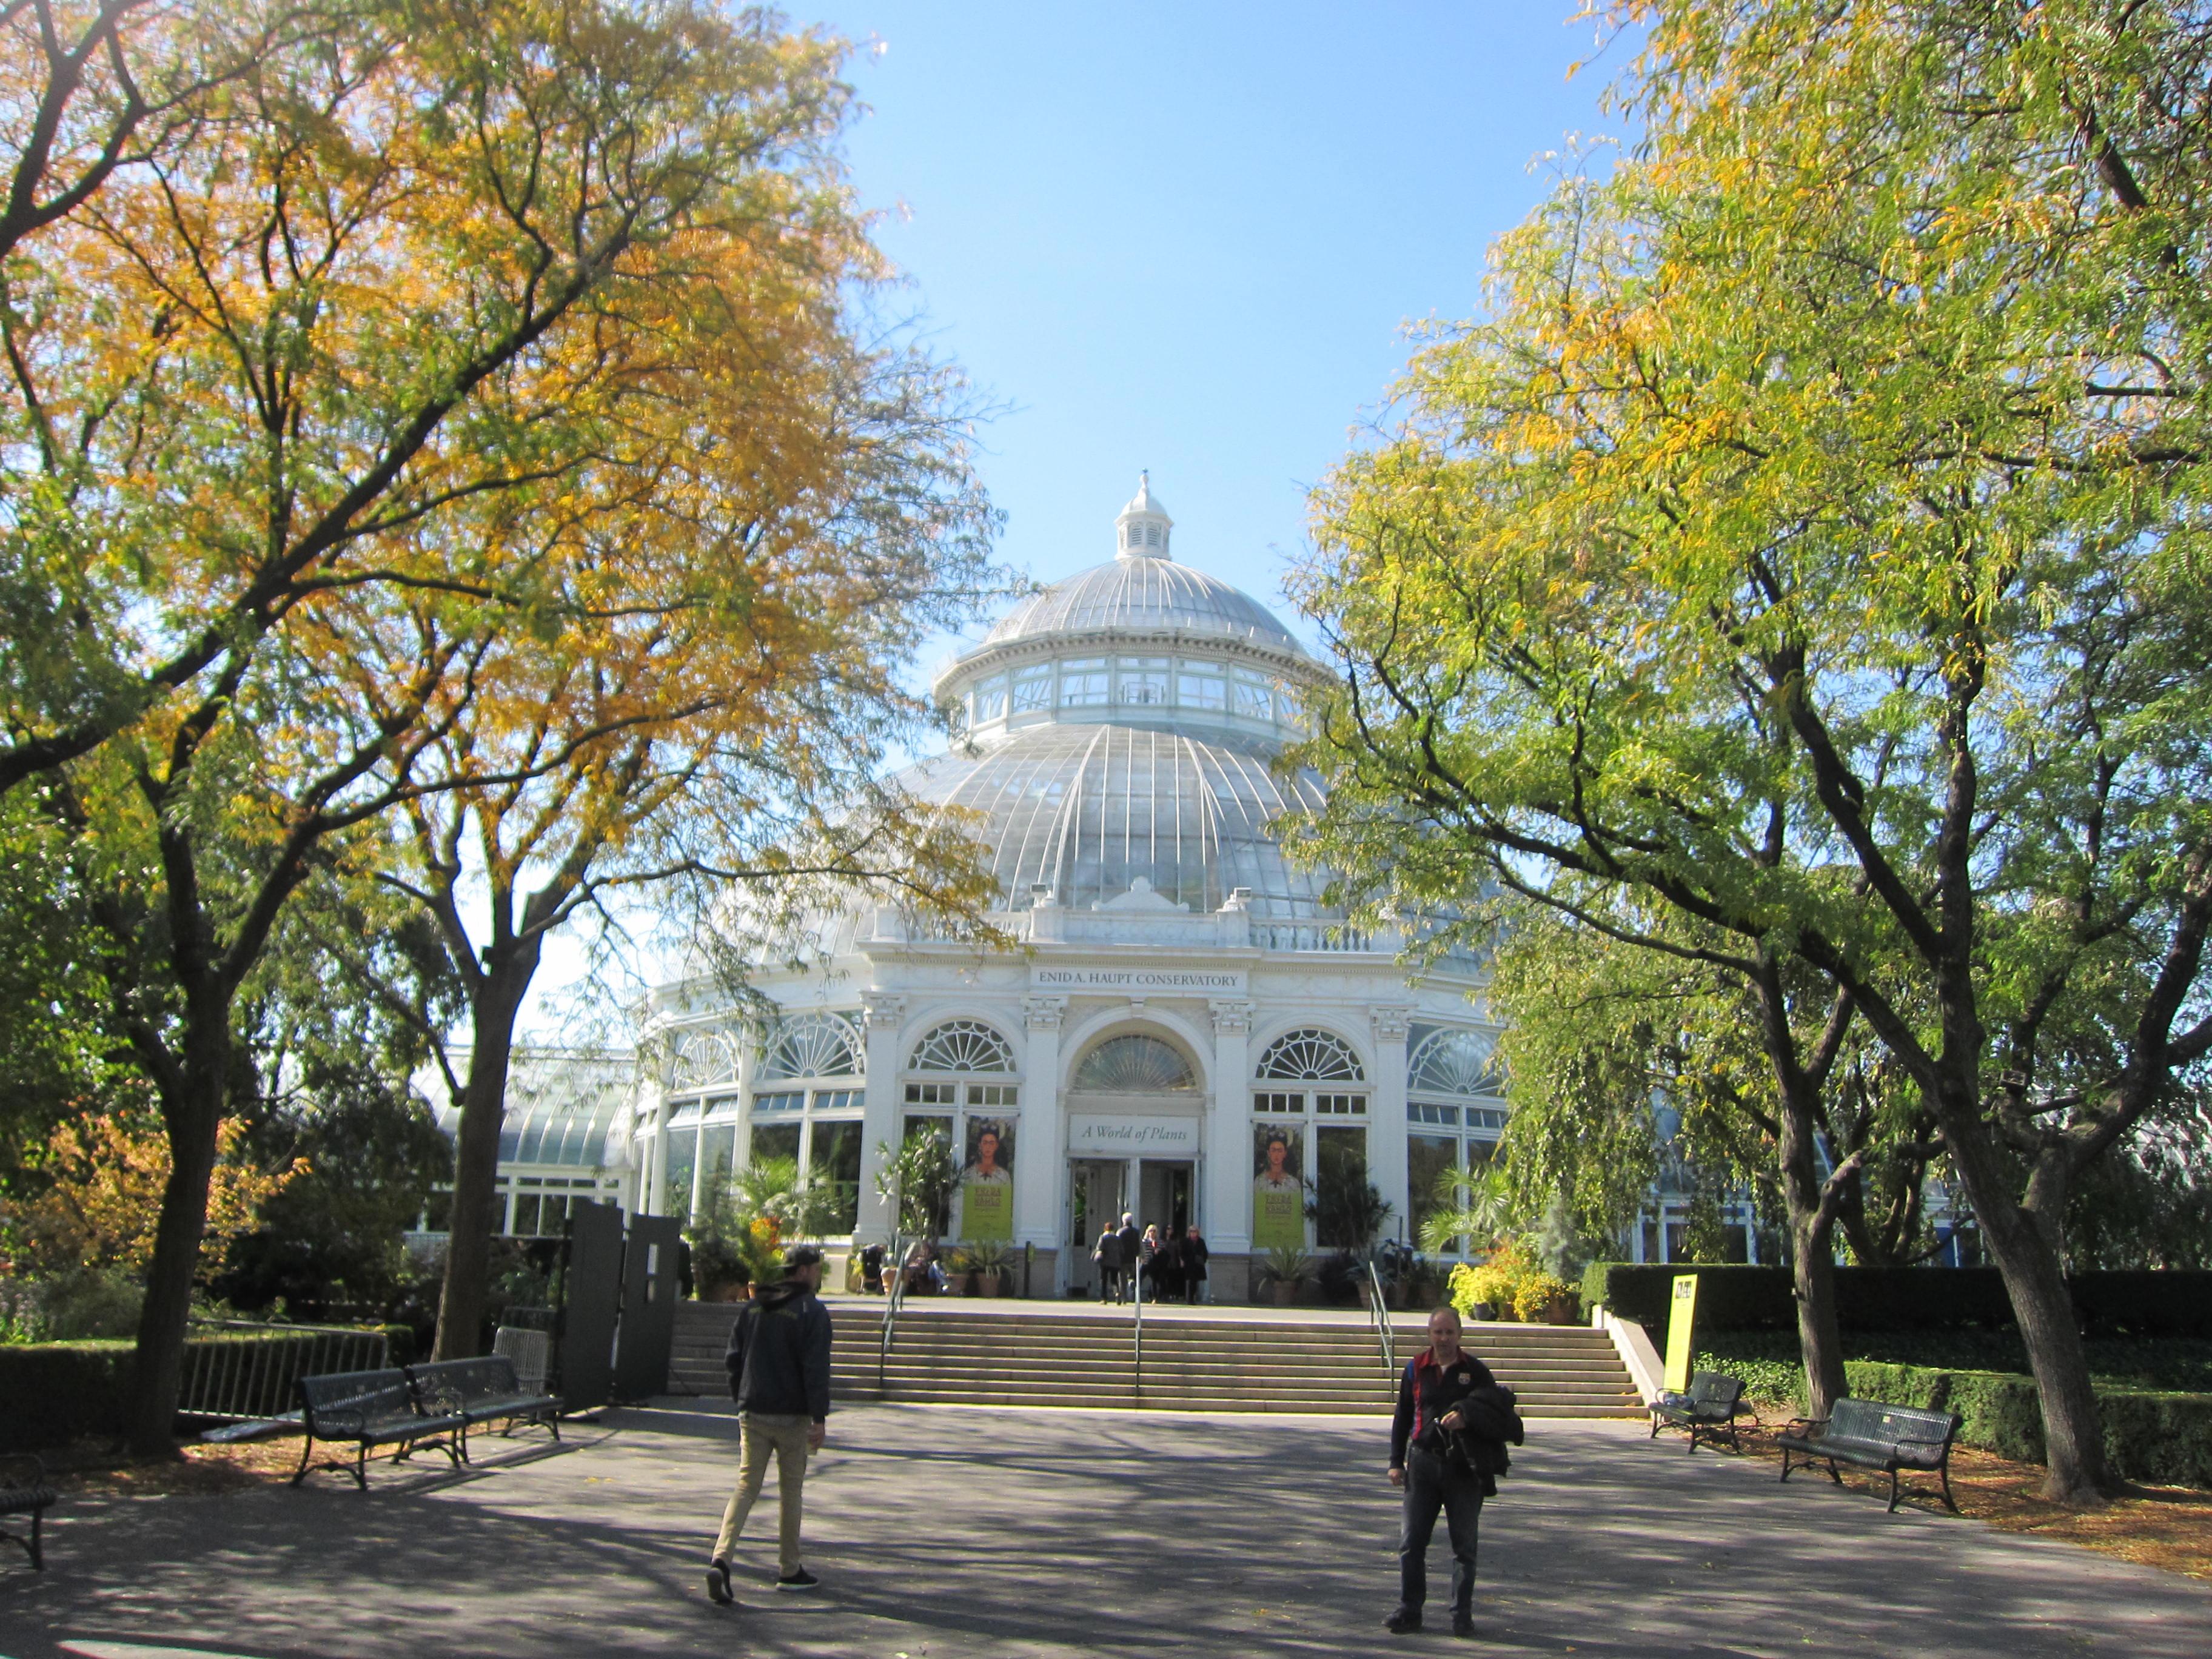 New York Botanical Gardens Bronx File New York Botanical Garden Bronx Jpg Wikimedia Commons